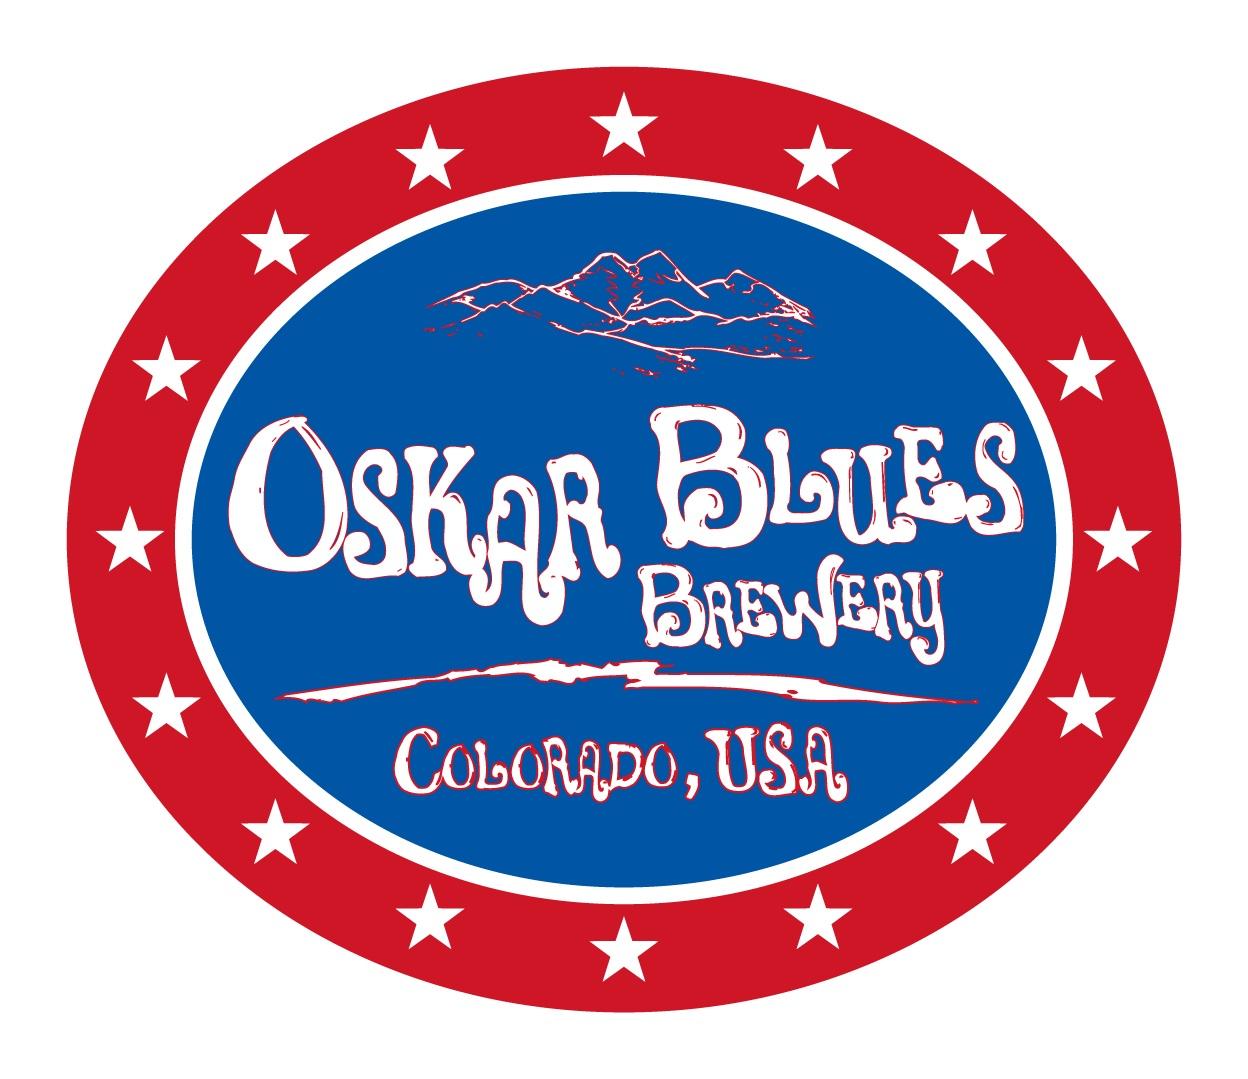 http://thewoodwardspine.files.wordpress.com/2013/05/oskar-blues-logo.jpg